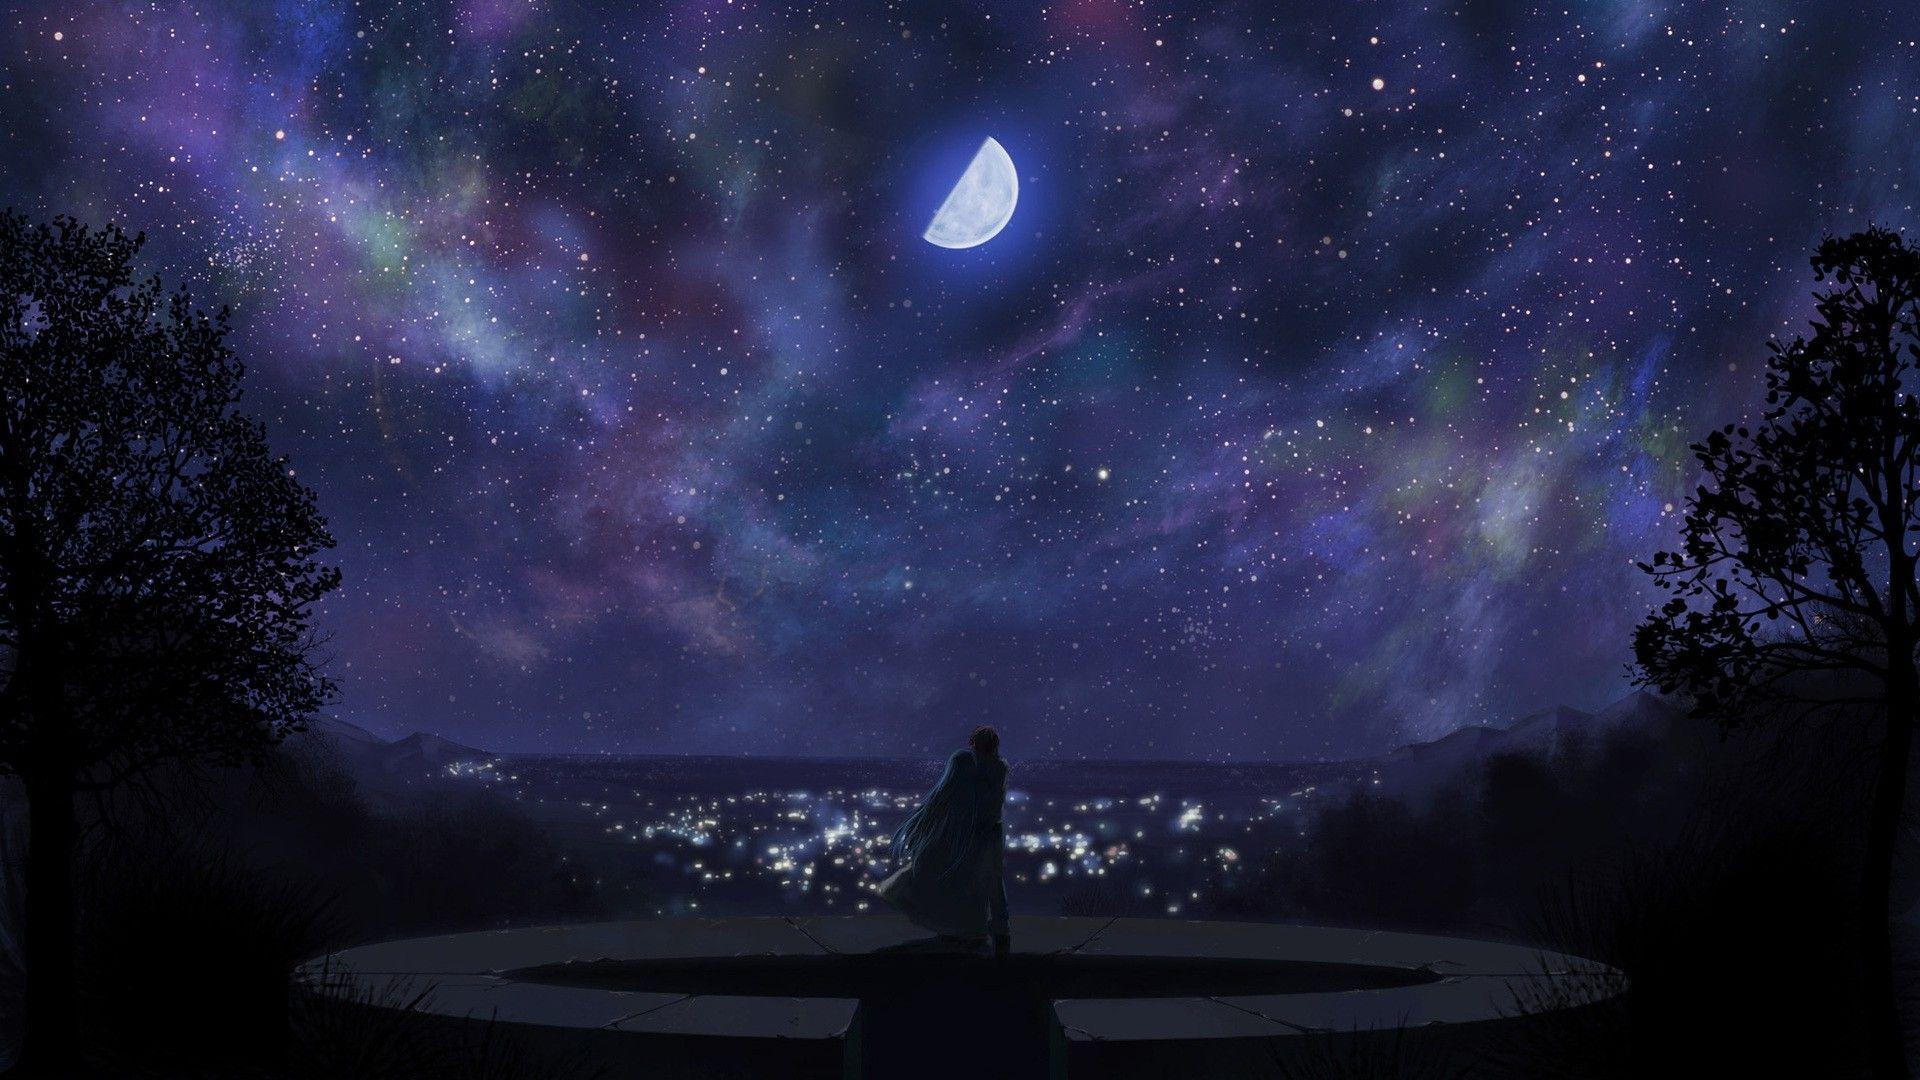 Fantasy Anime Wallpaper Anime Background Night Sky Wallpaper Ribbon In The Sky